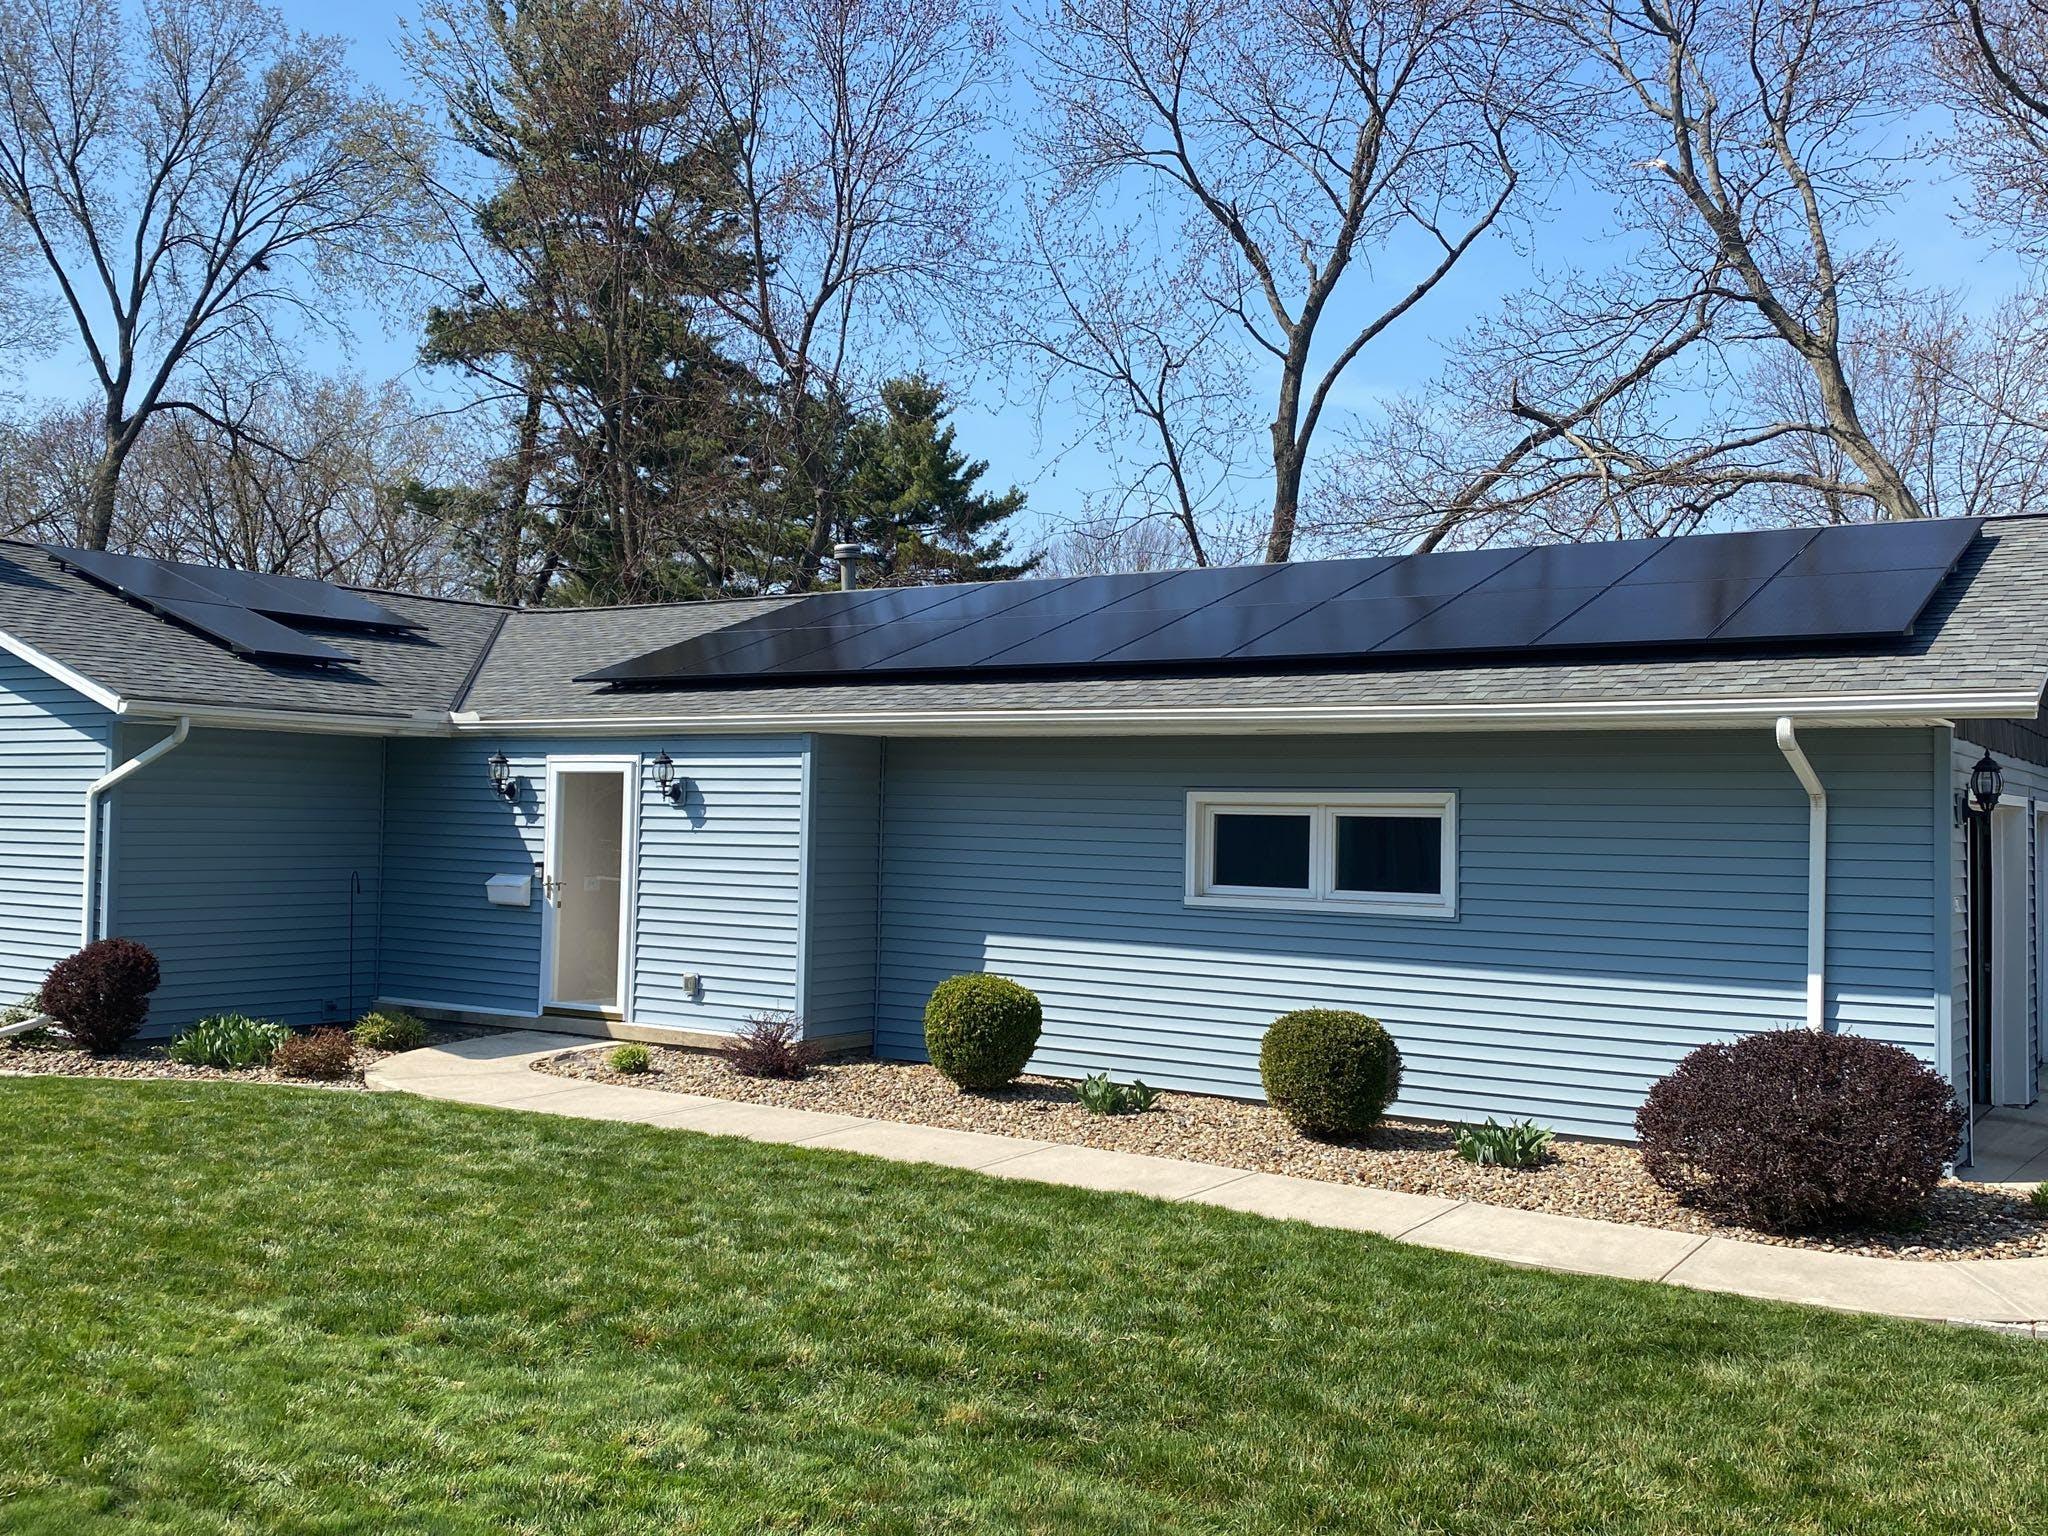 Appalachian Renewable Power Systems solar panel installation on house